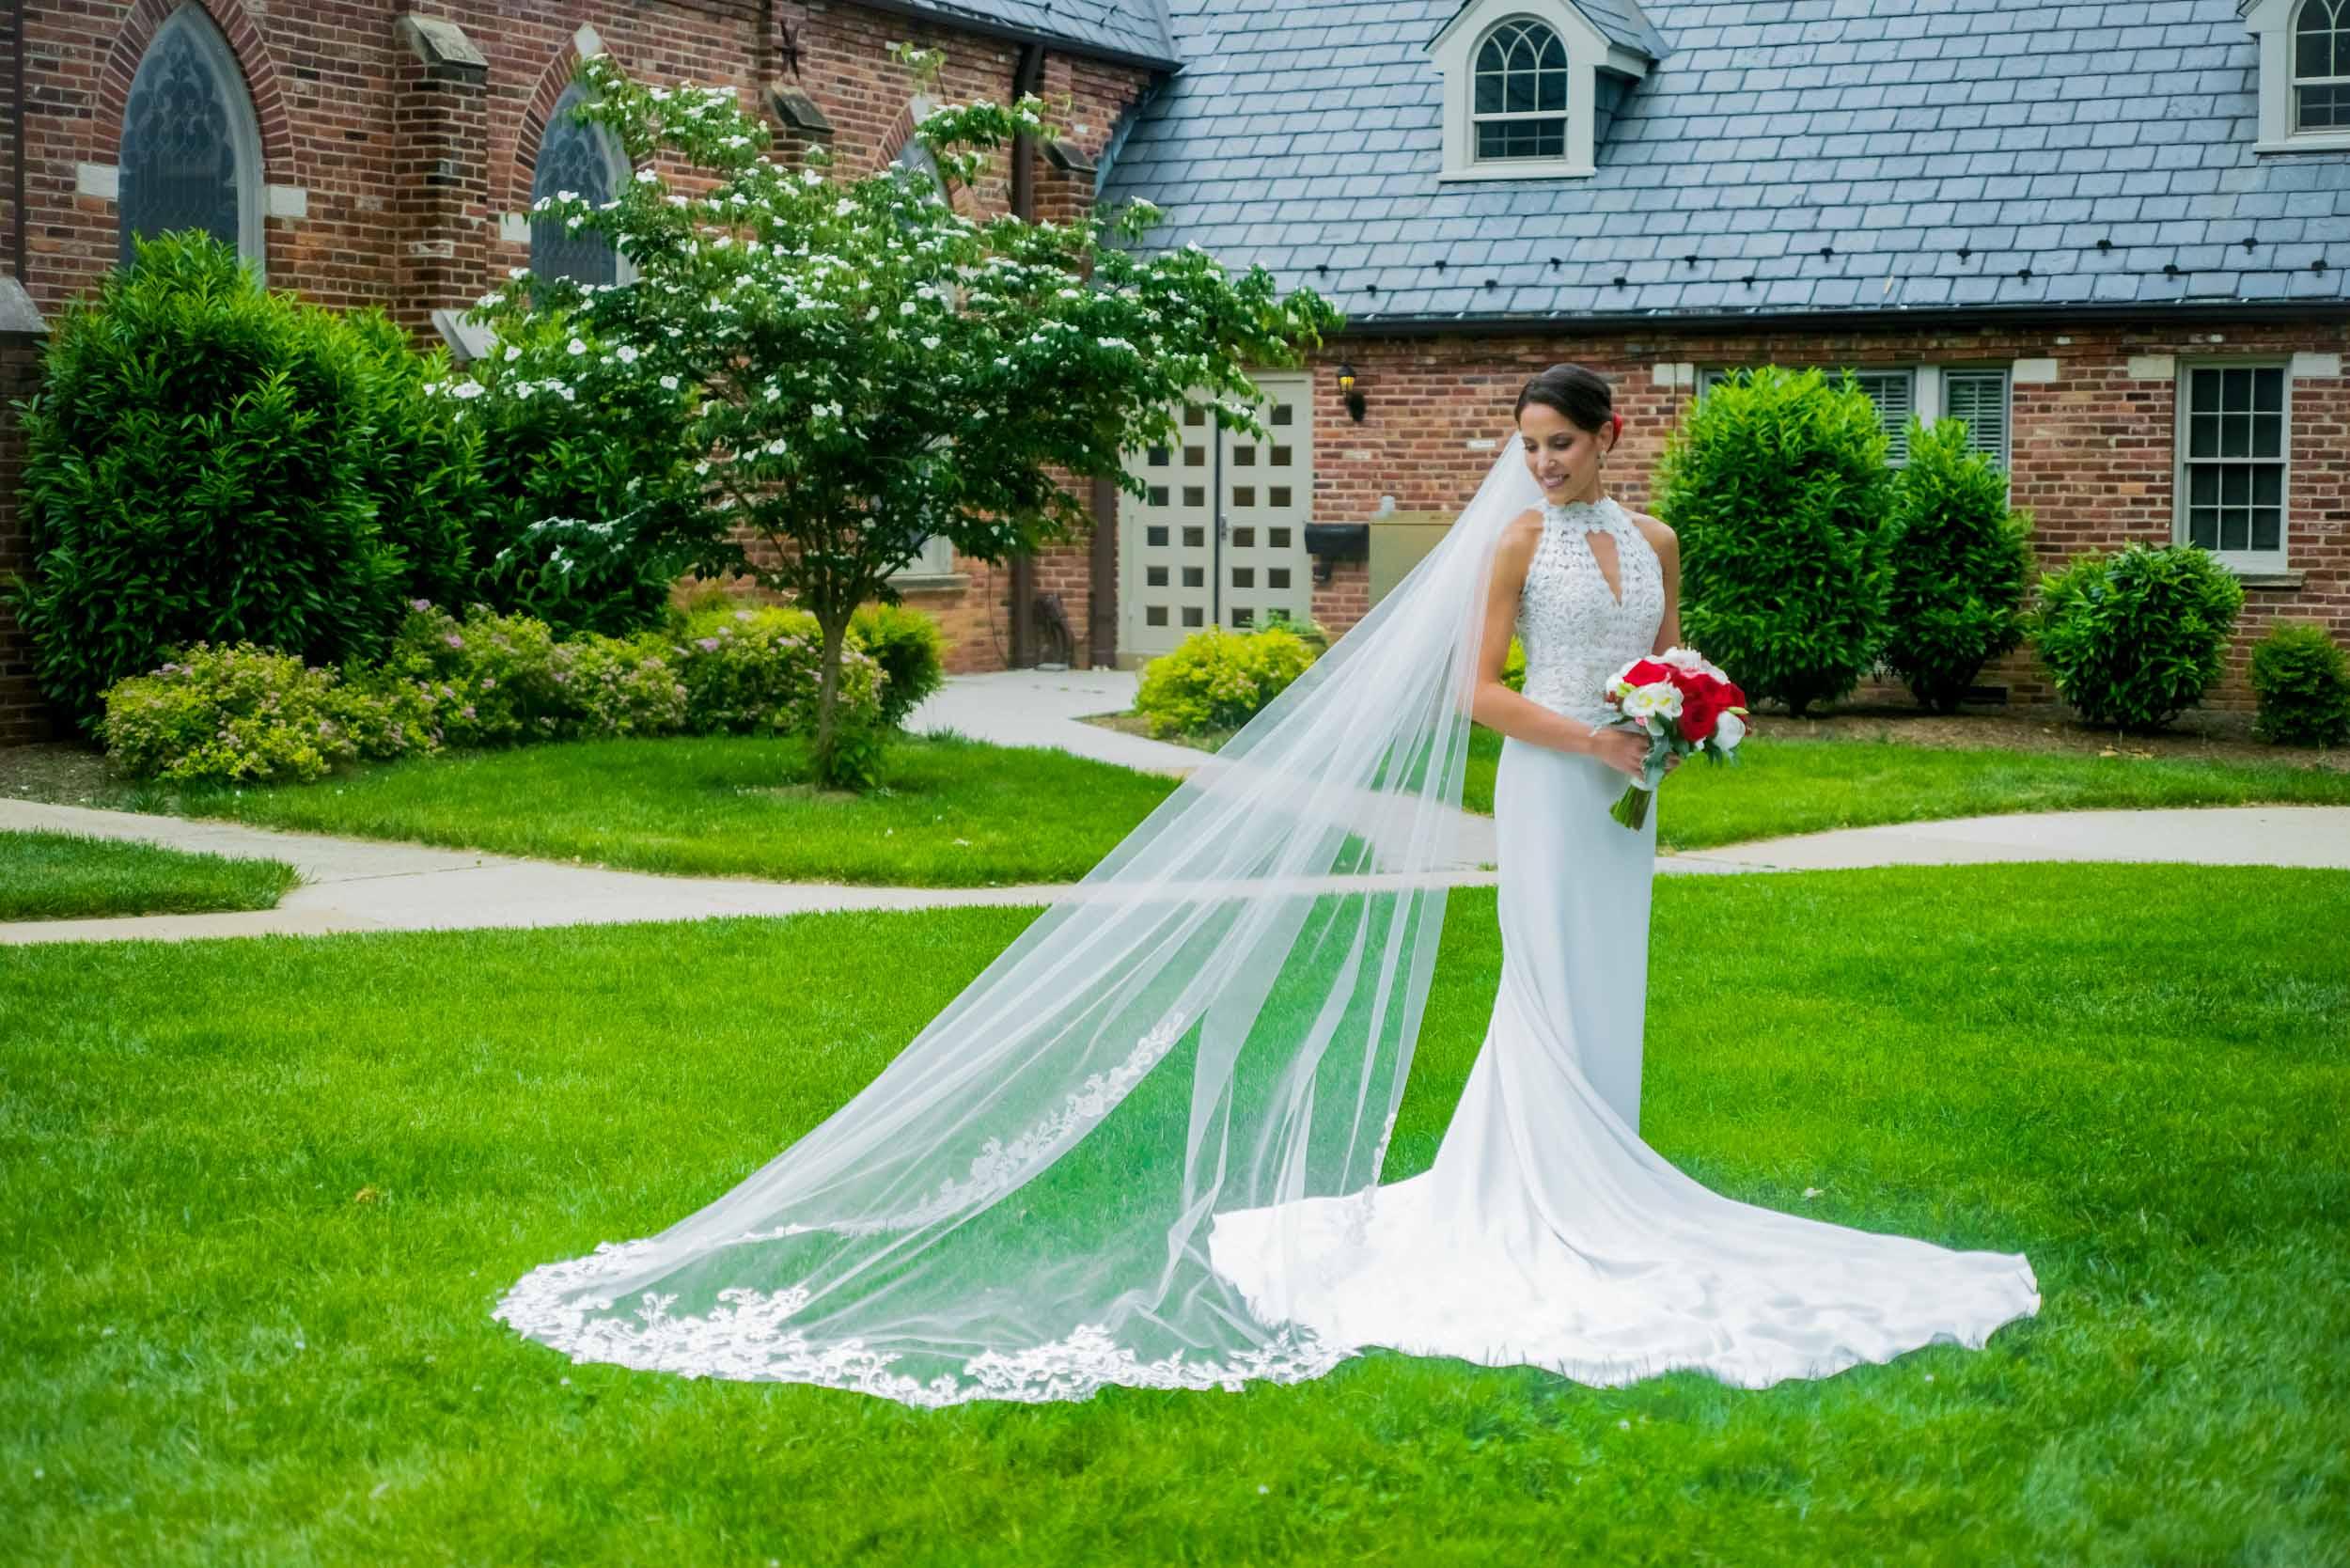 dc+metro+wedding+photographer+vadym+guliuk+photography+wedding+bride-2029.jpg